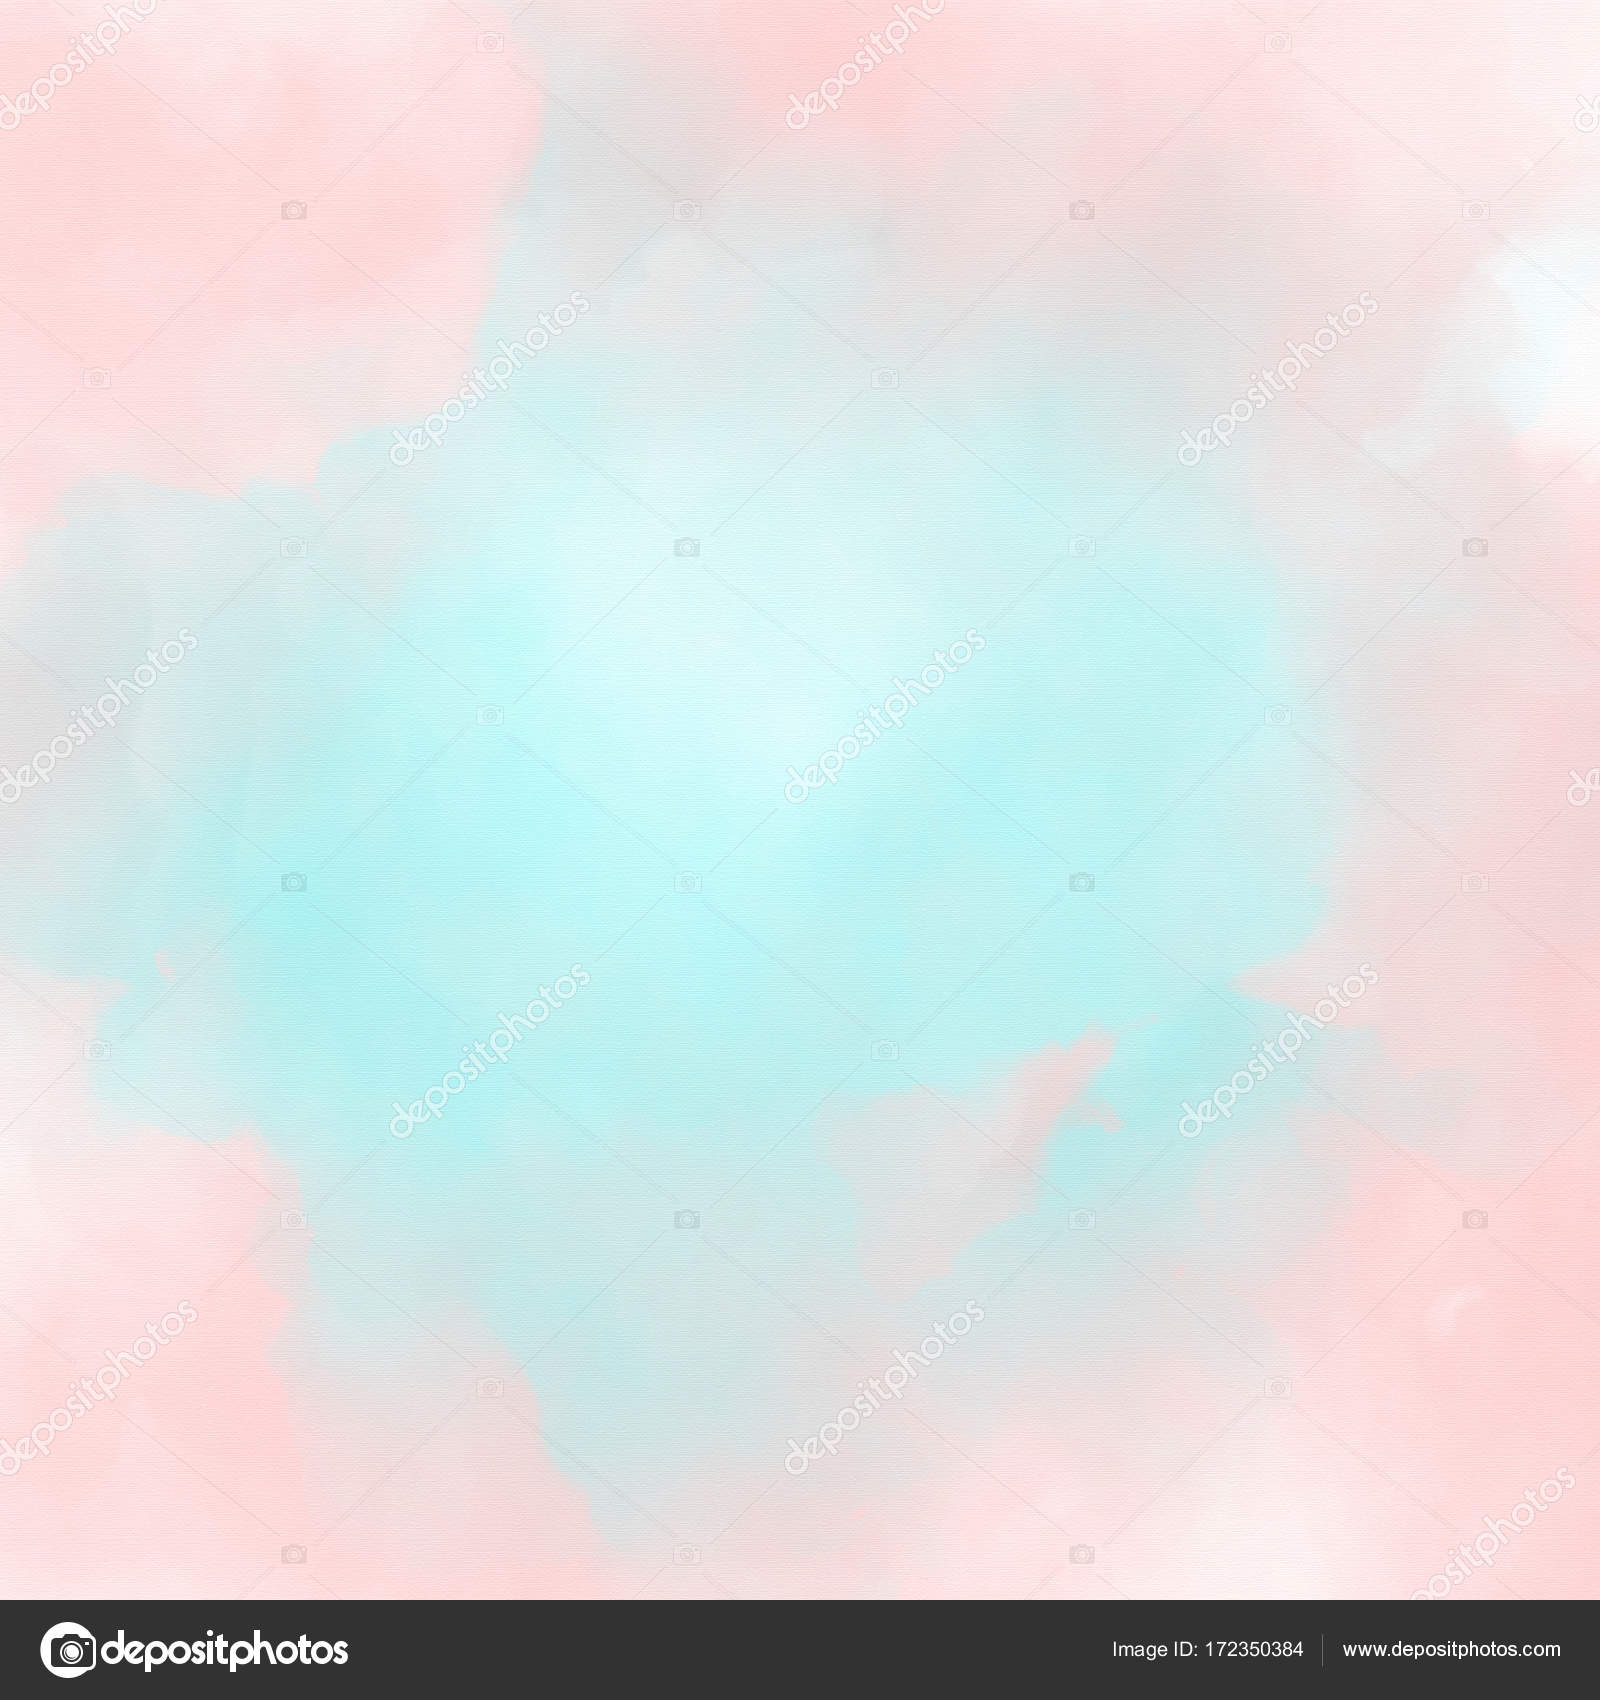 Pastel Watercolor Background Stock Photo C Jpkirakun 172350384